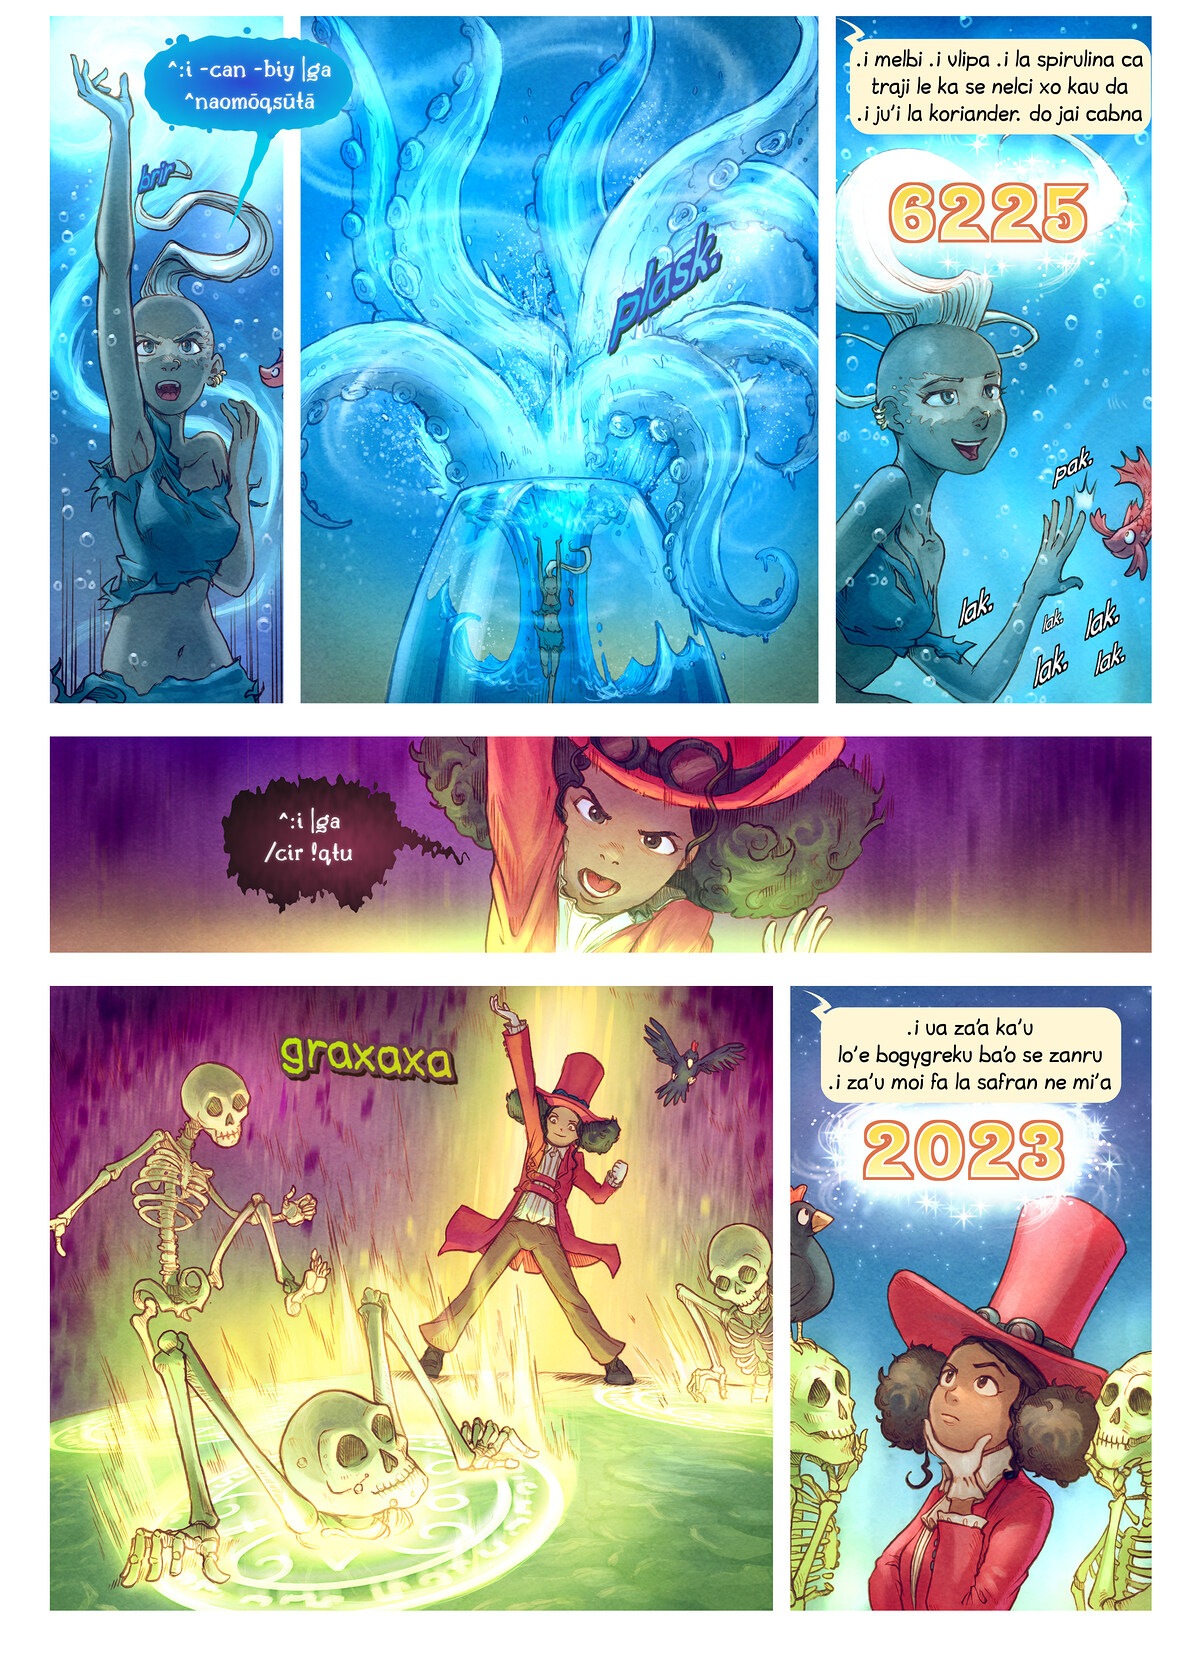 A webcomic page of Pepper&Carrot, pagbu 22 [jb], papri 7